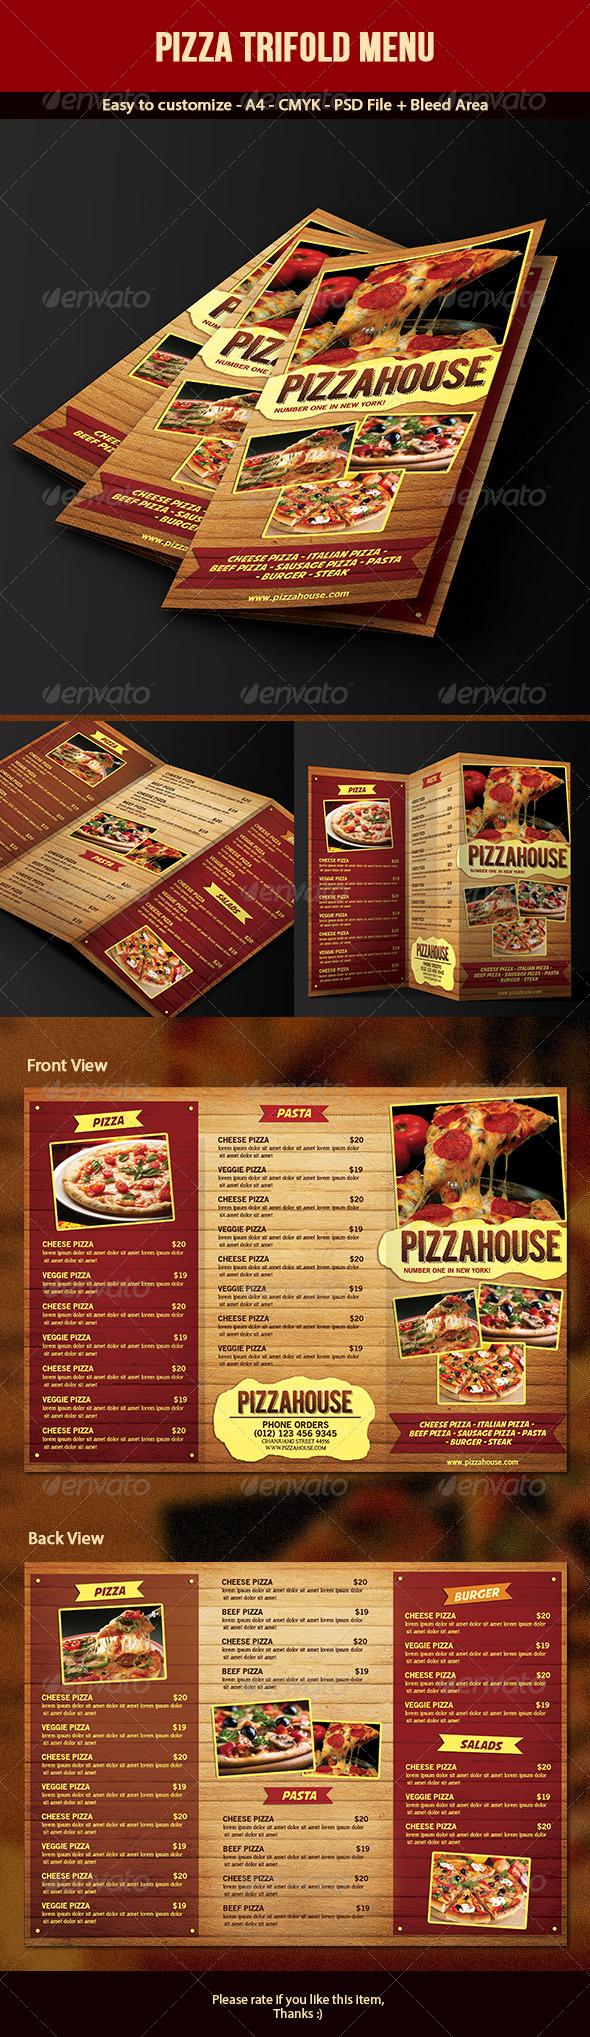 Trifold Pizza Menu - Food Menus Print Templates